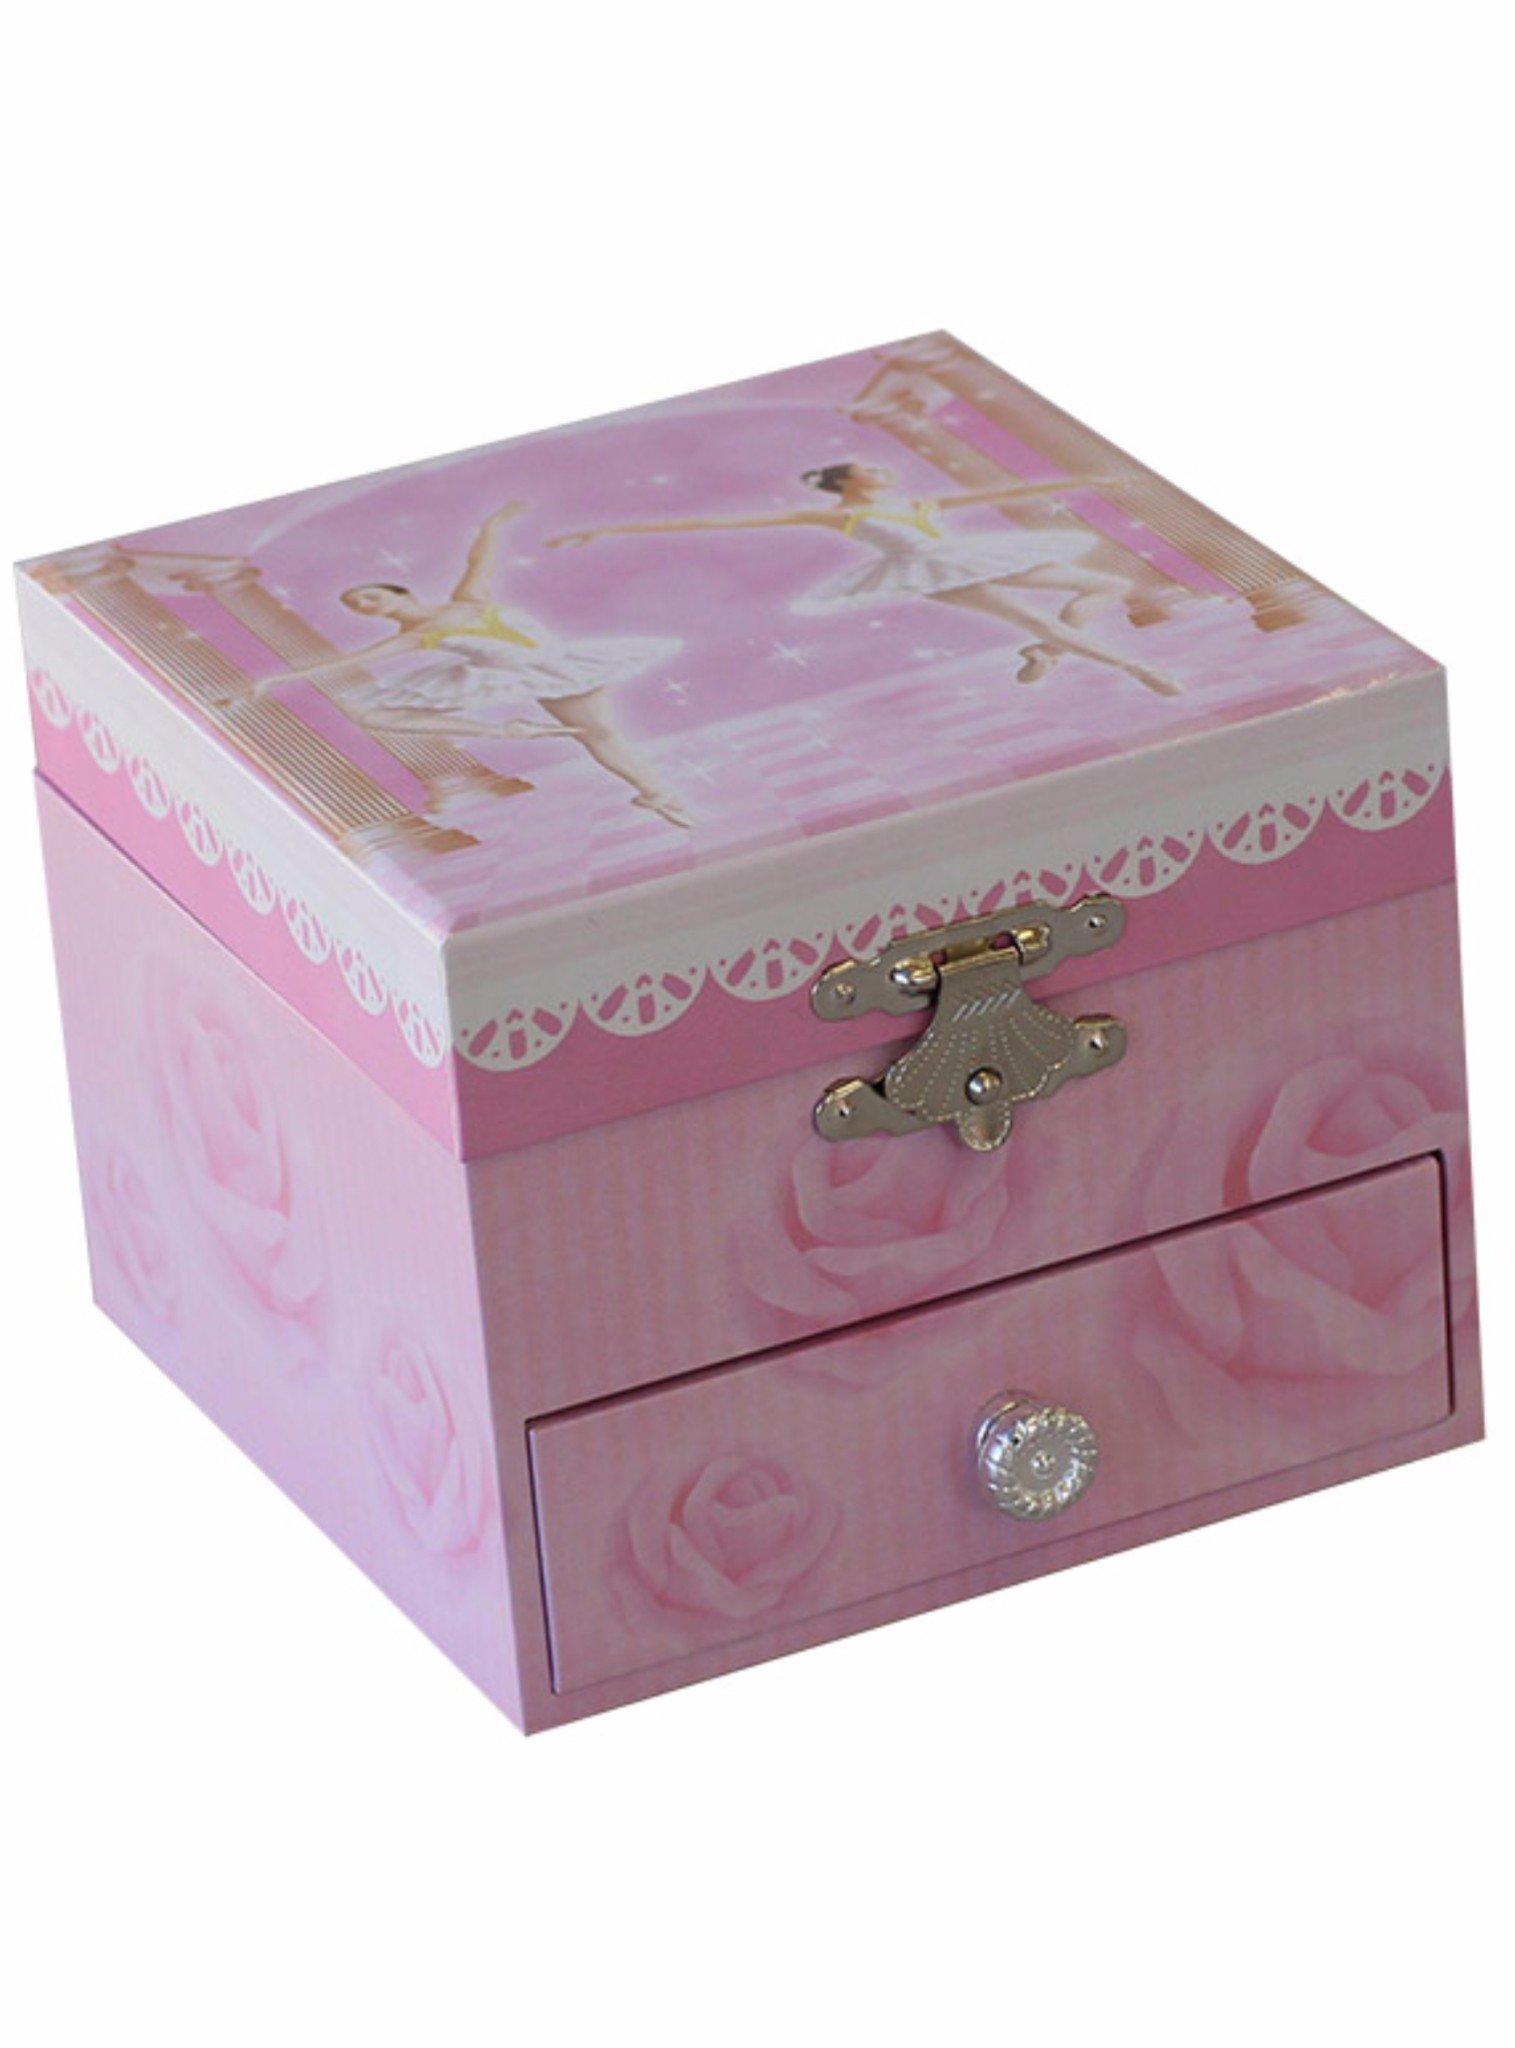 Ballet Dancer Ballerina Musical Jewellery Box